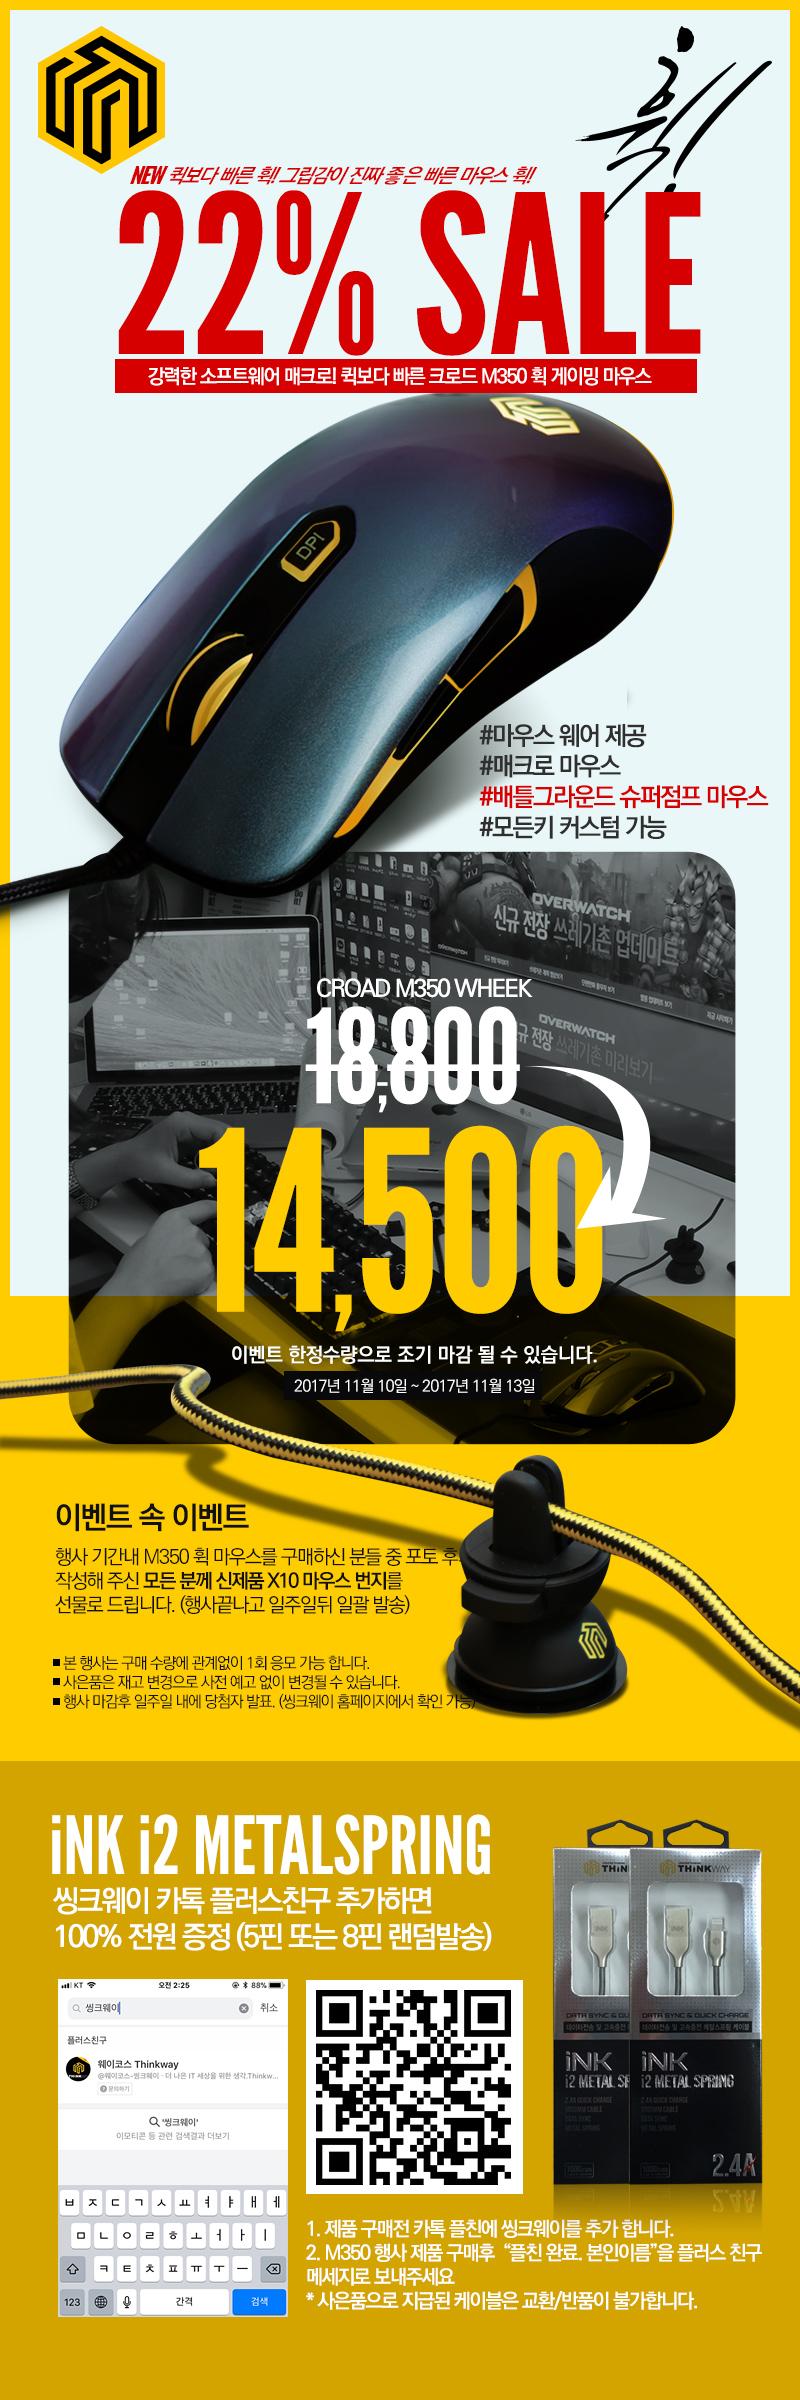 m350-event-20171110.jpg